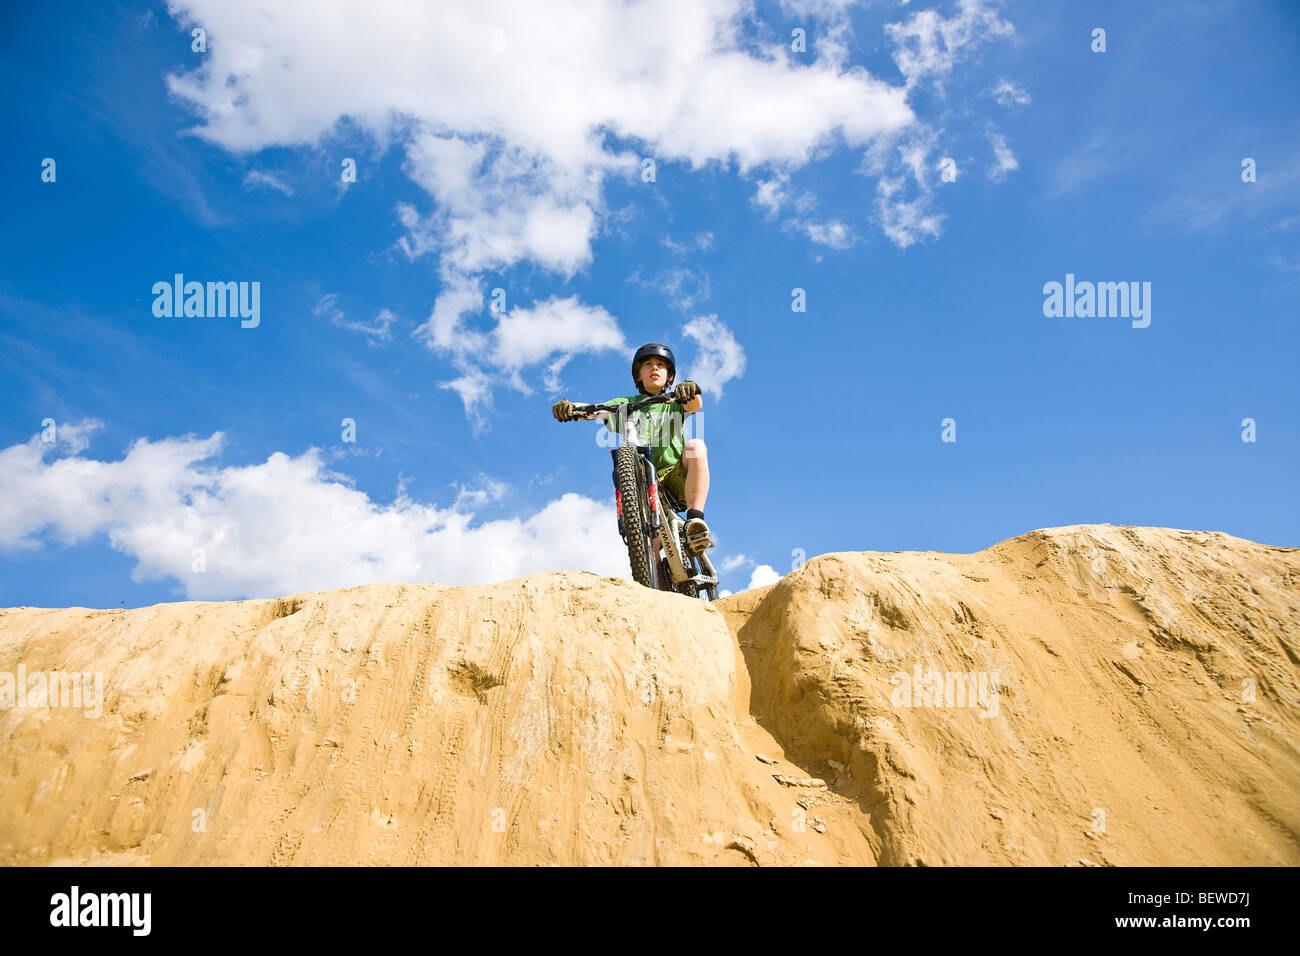 teenage mountain biker, view from below - Stock Image